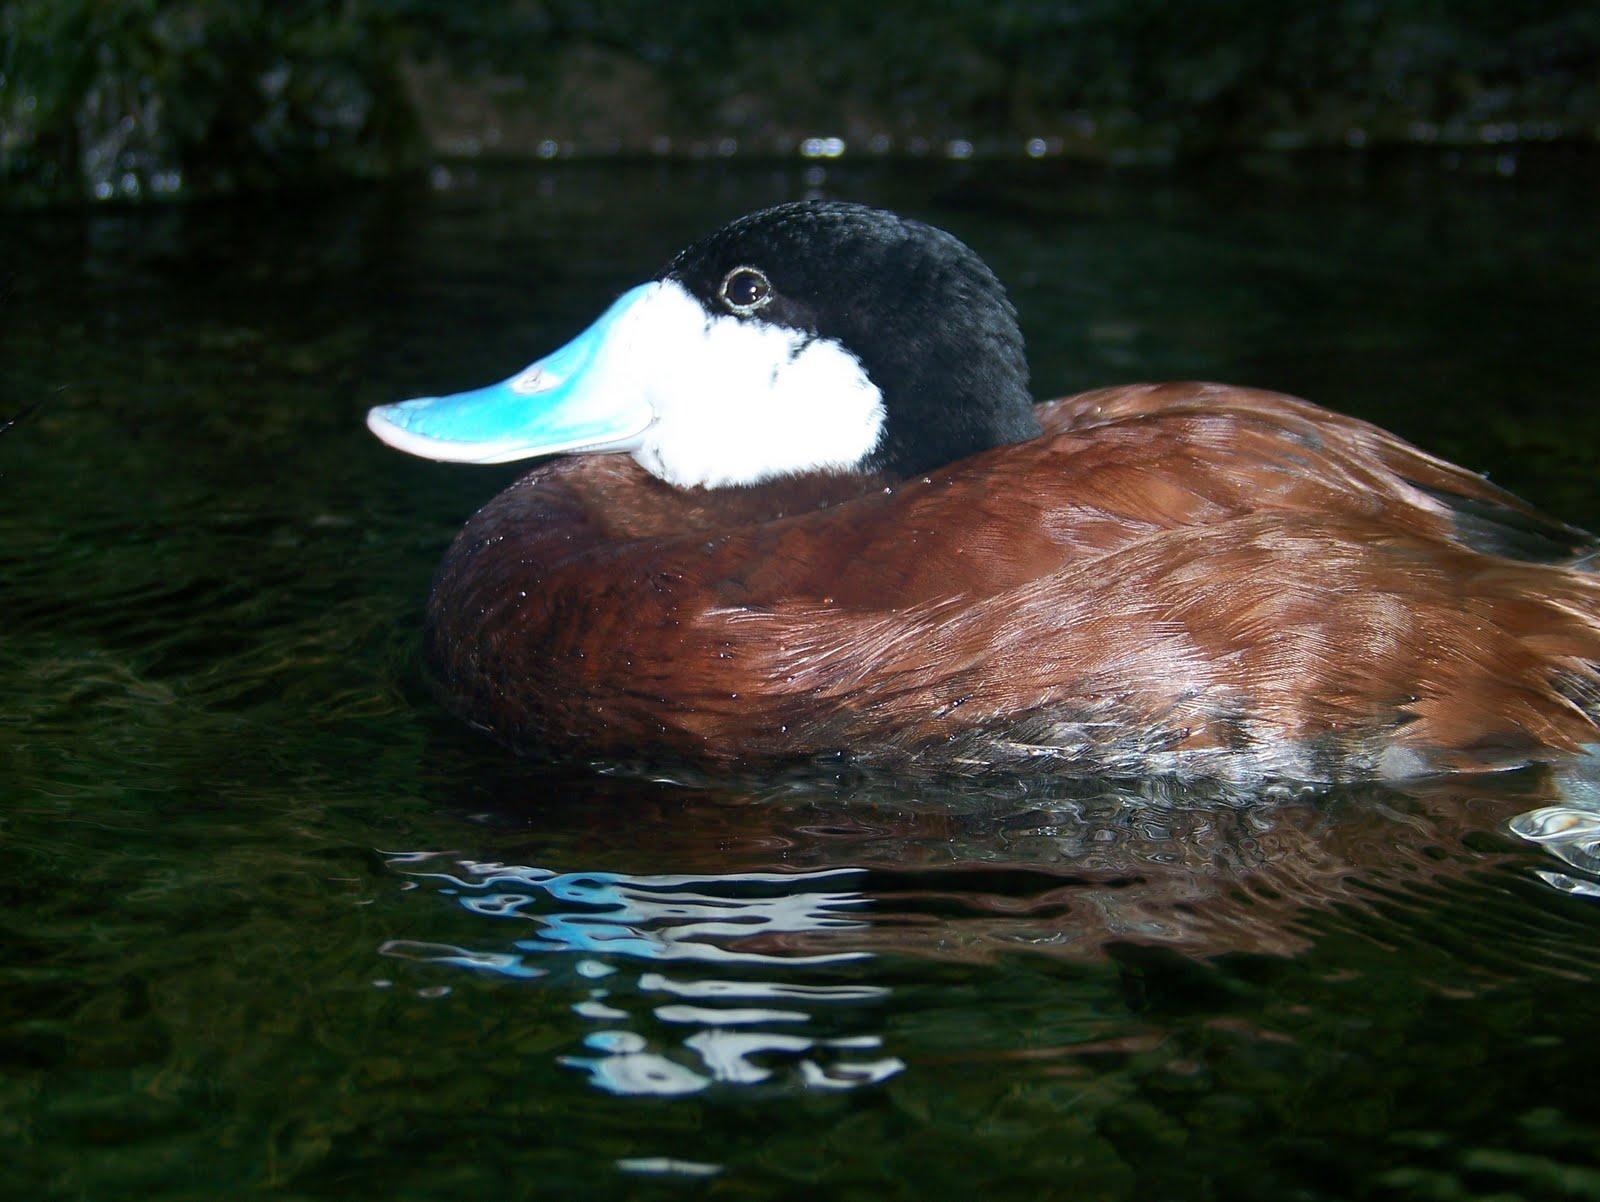 http://1.bp.blogspot.com/_S3FtWvyjIWg/S_KvLUq33RI/AAAAAAAAAVA/K-0WNsQ4n-U/s1600/ducks+001.jpg